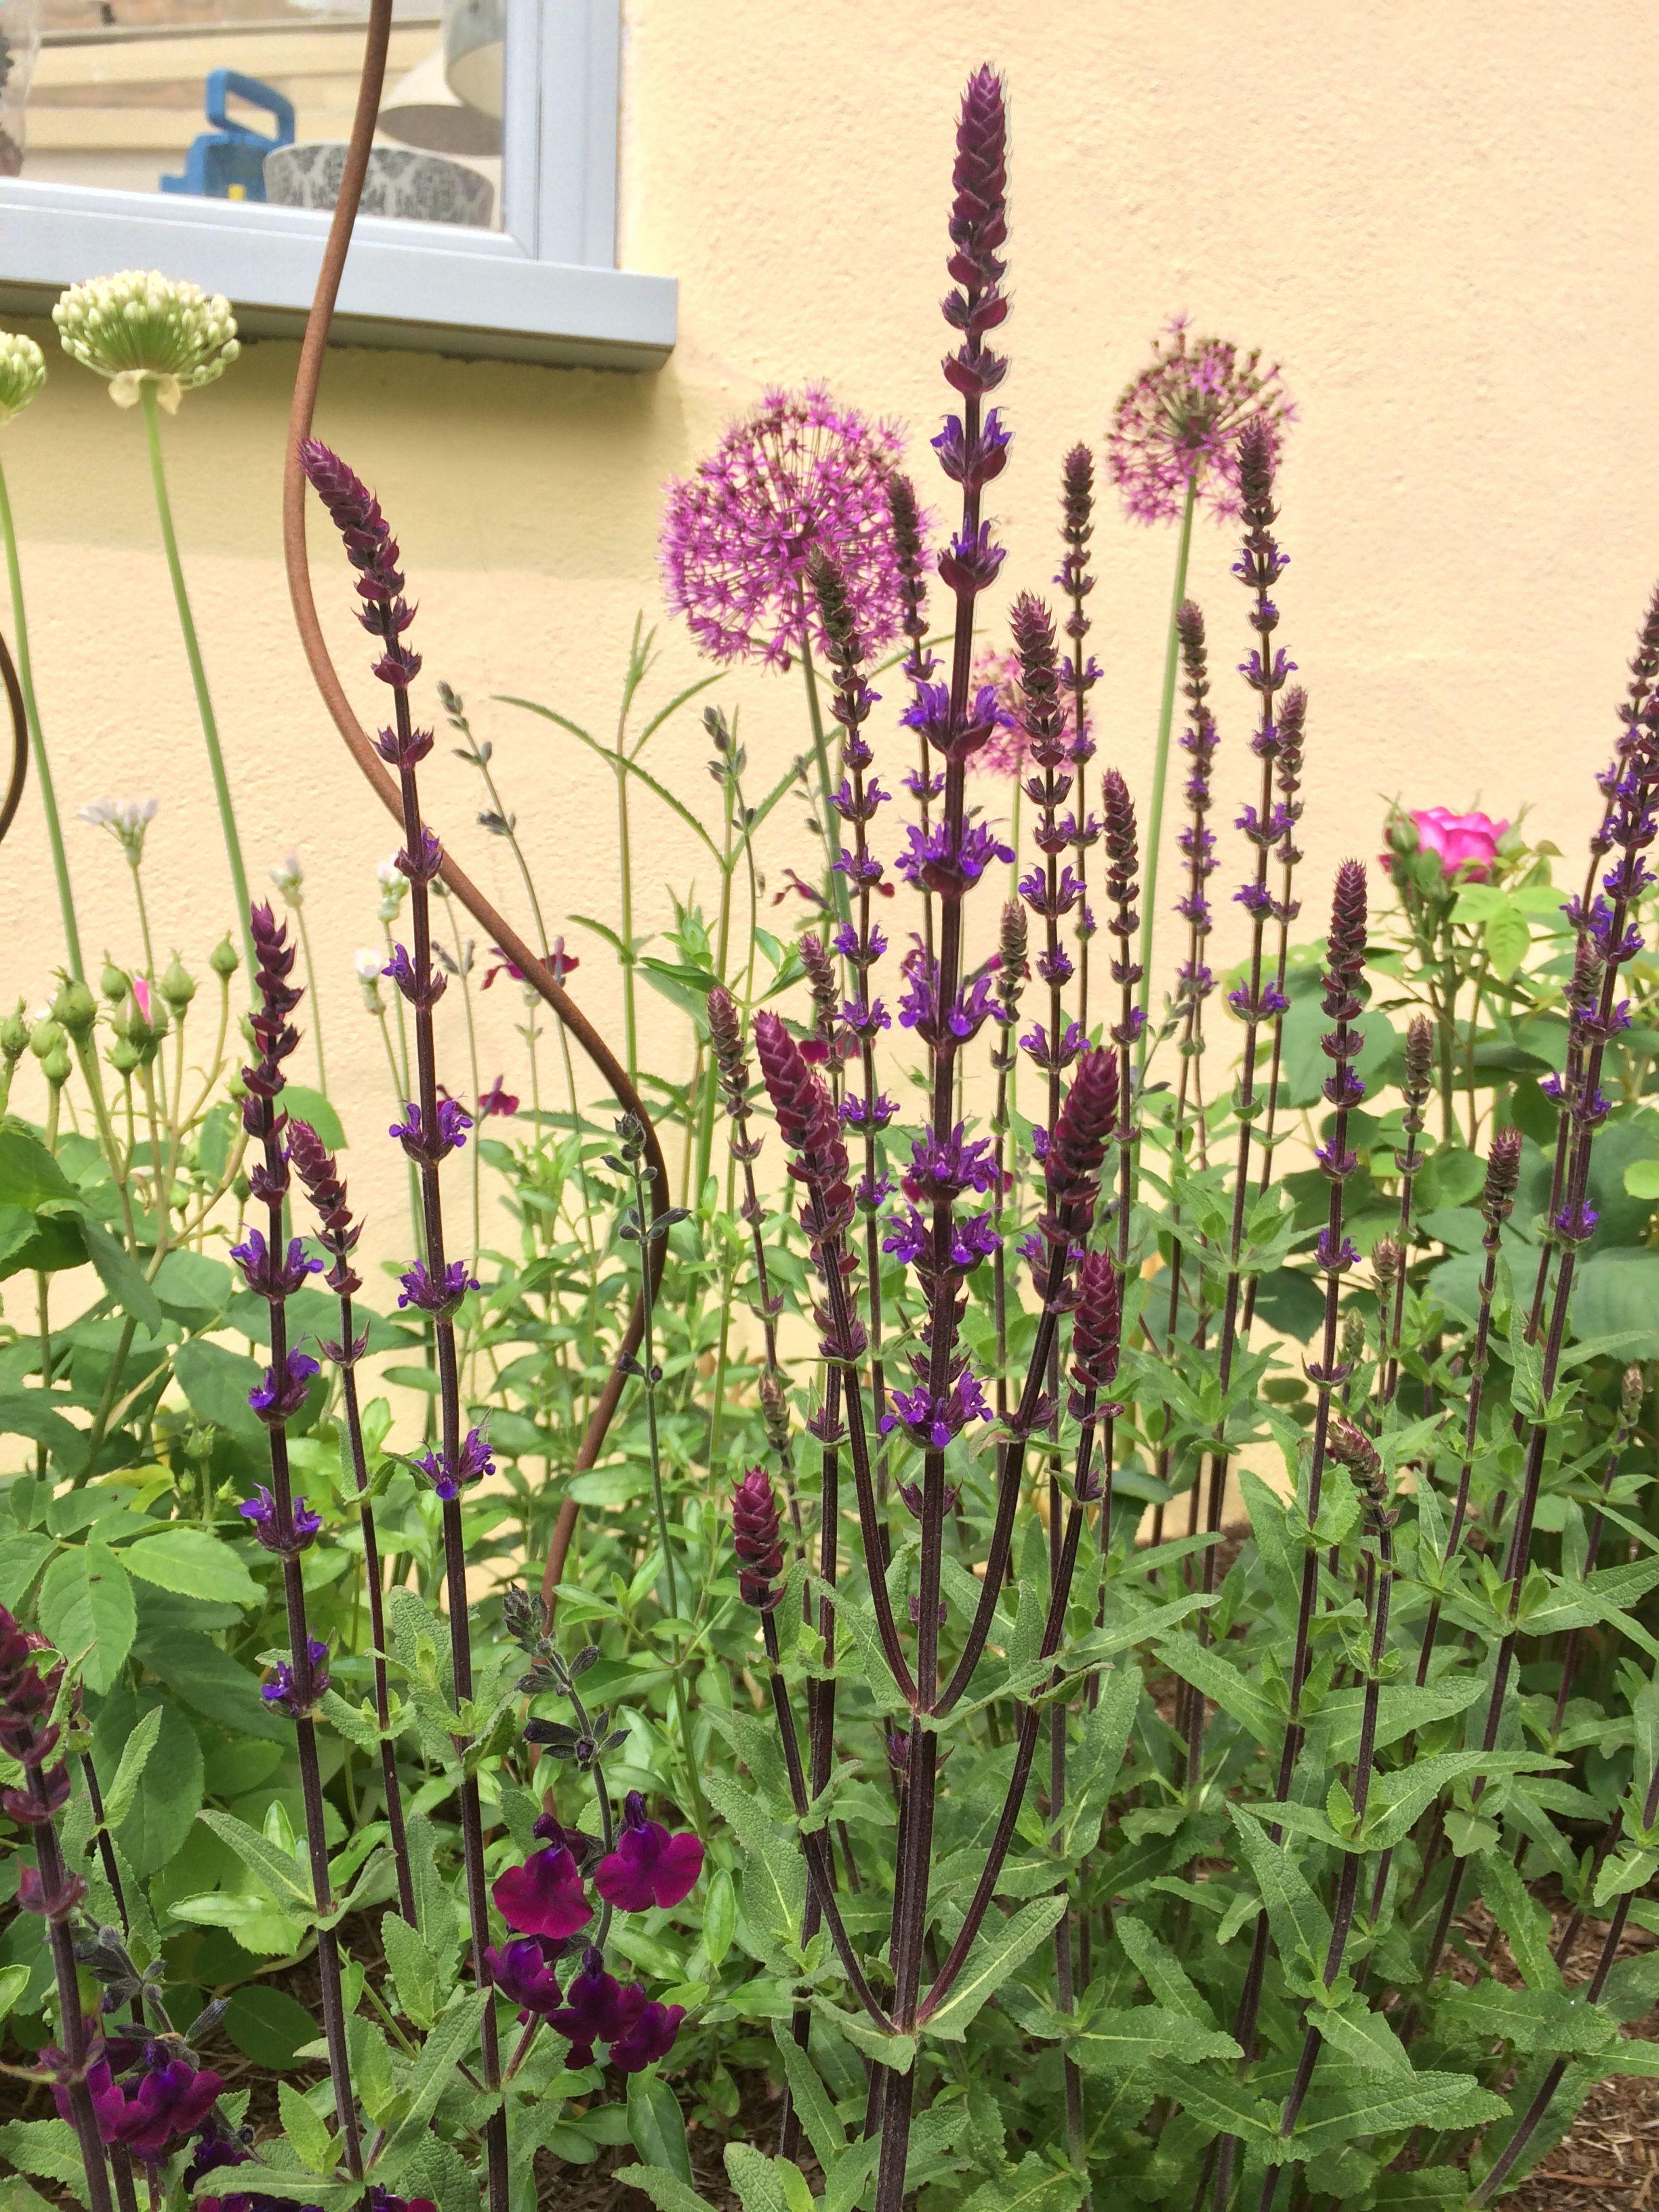 Salvia Nemerosa Caradonna Salvia Jamensis Nachtvlinder Allium Purple Sensation English Garden Plants Salvia